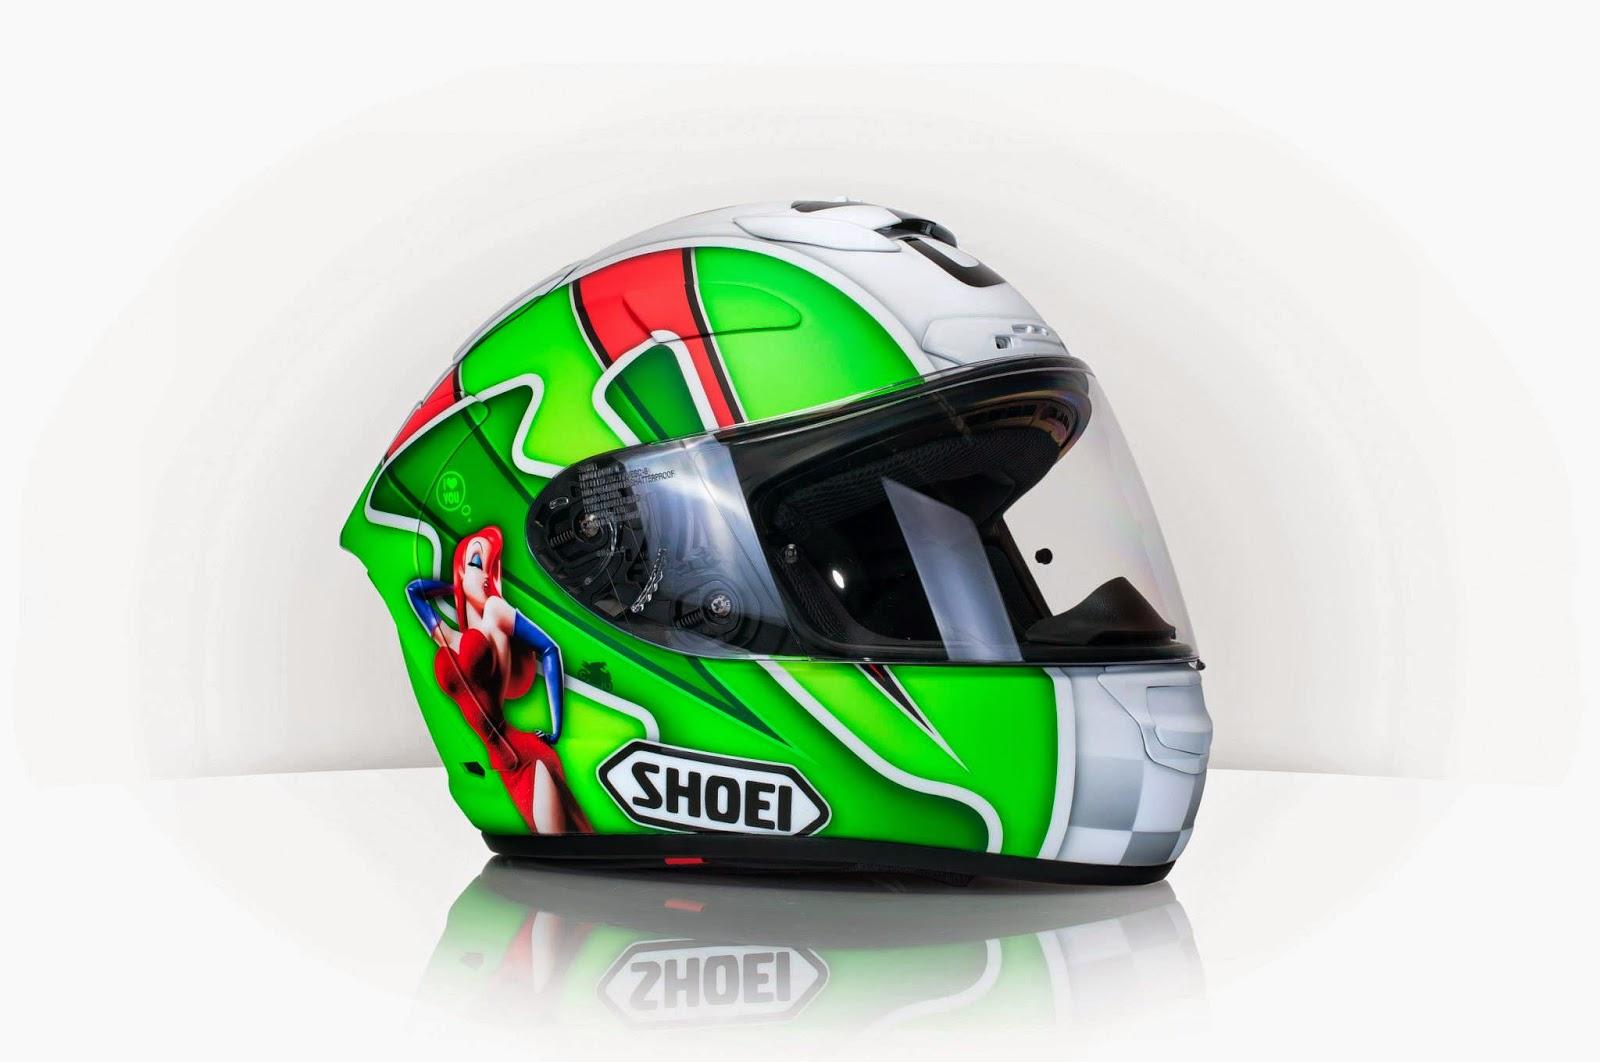 racing helmets garage shoei x spirit ii j m lson 2013 by tribilia design. Black Bedroom Furniture Sets. Home Design Ideas